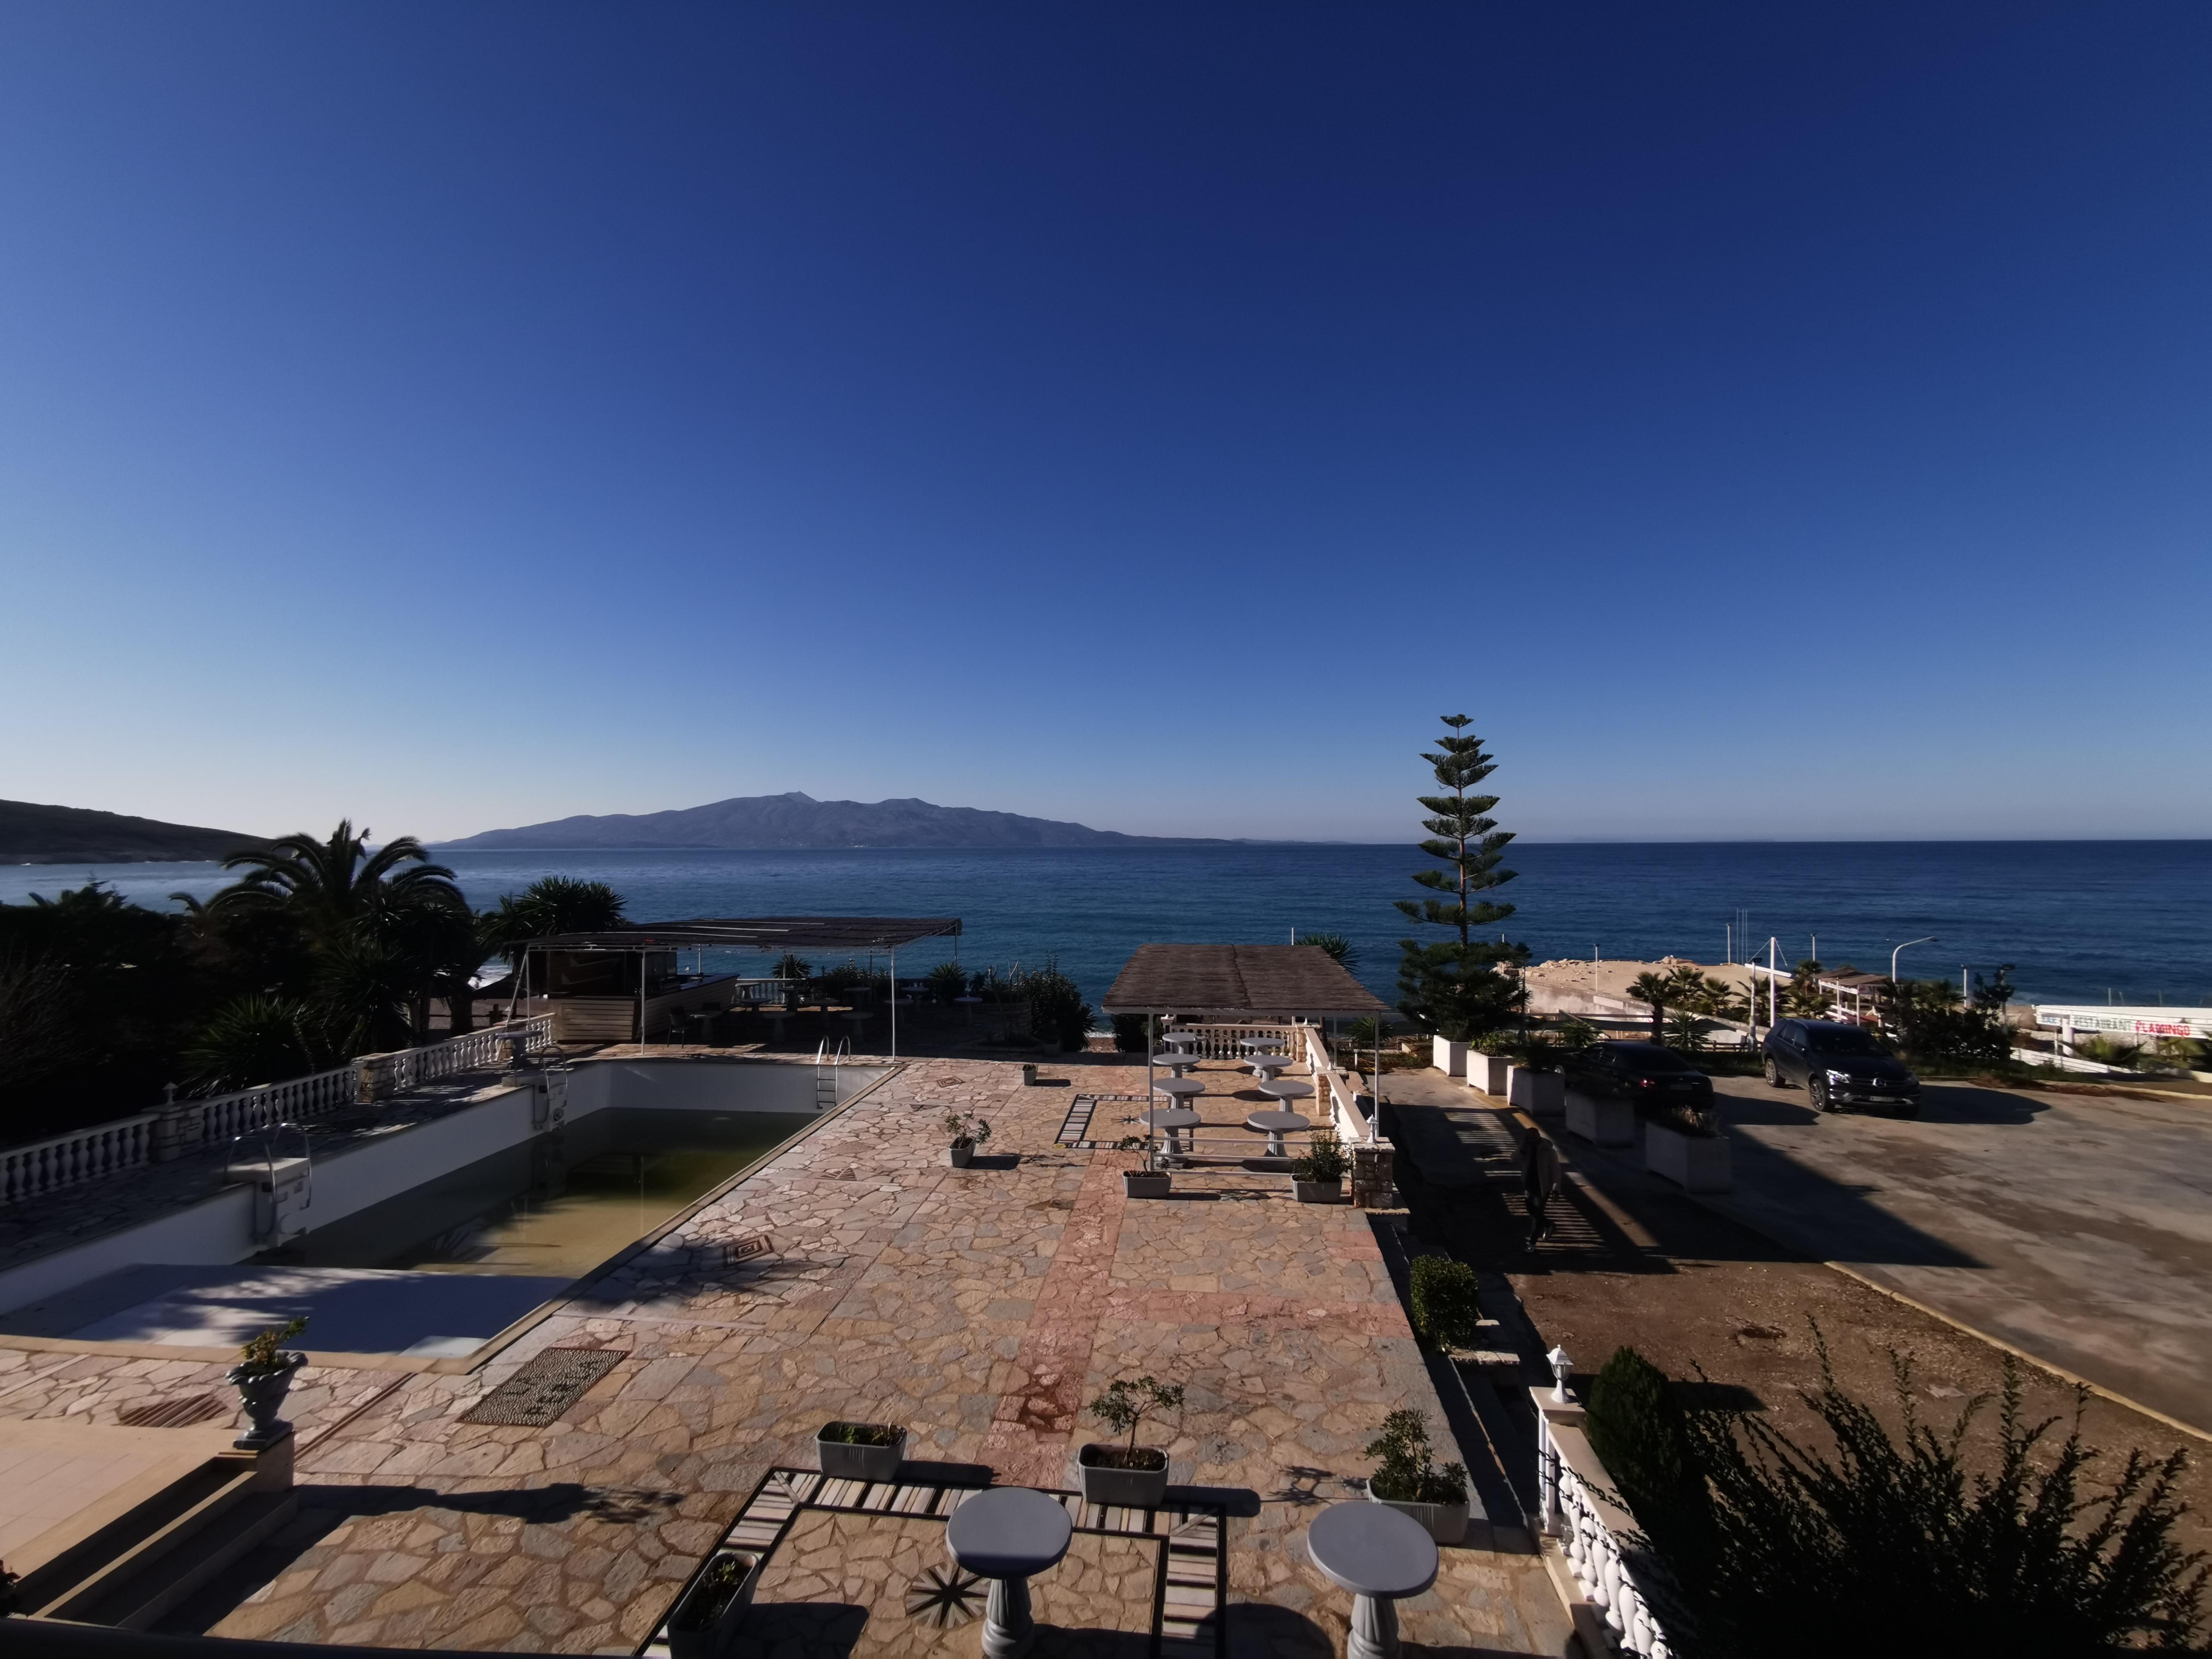 Letovanje Albanija hoteli, Saranda, autobus, Hotel Perla, hotelska terasa